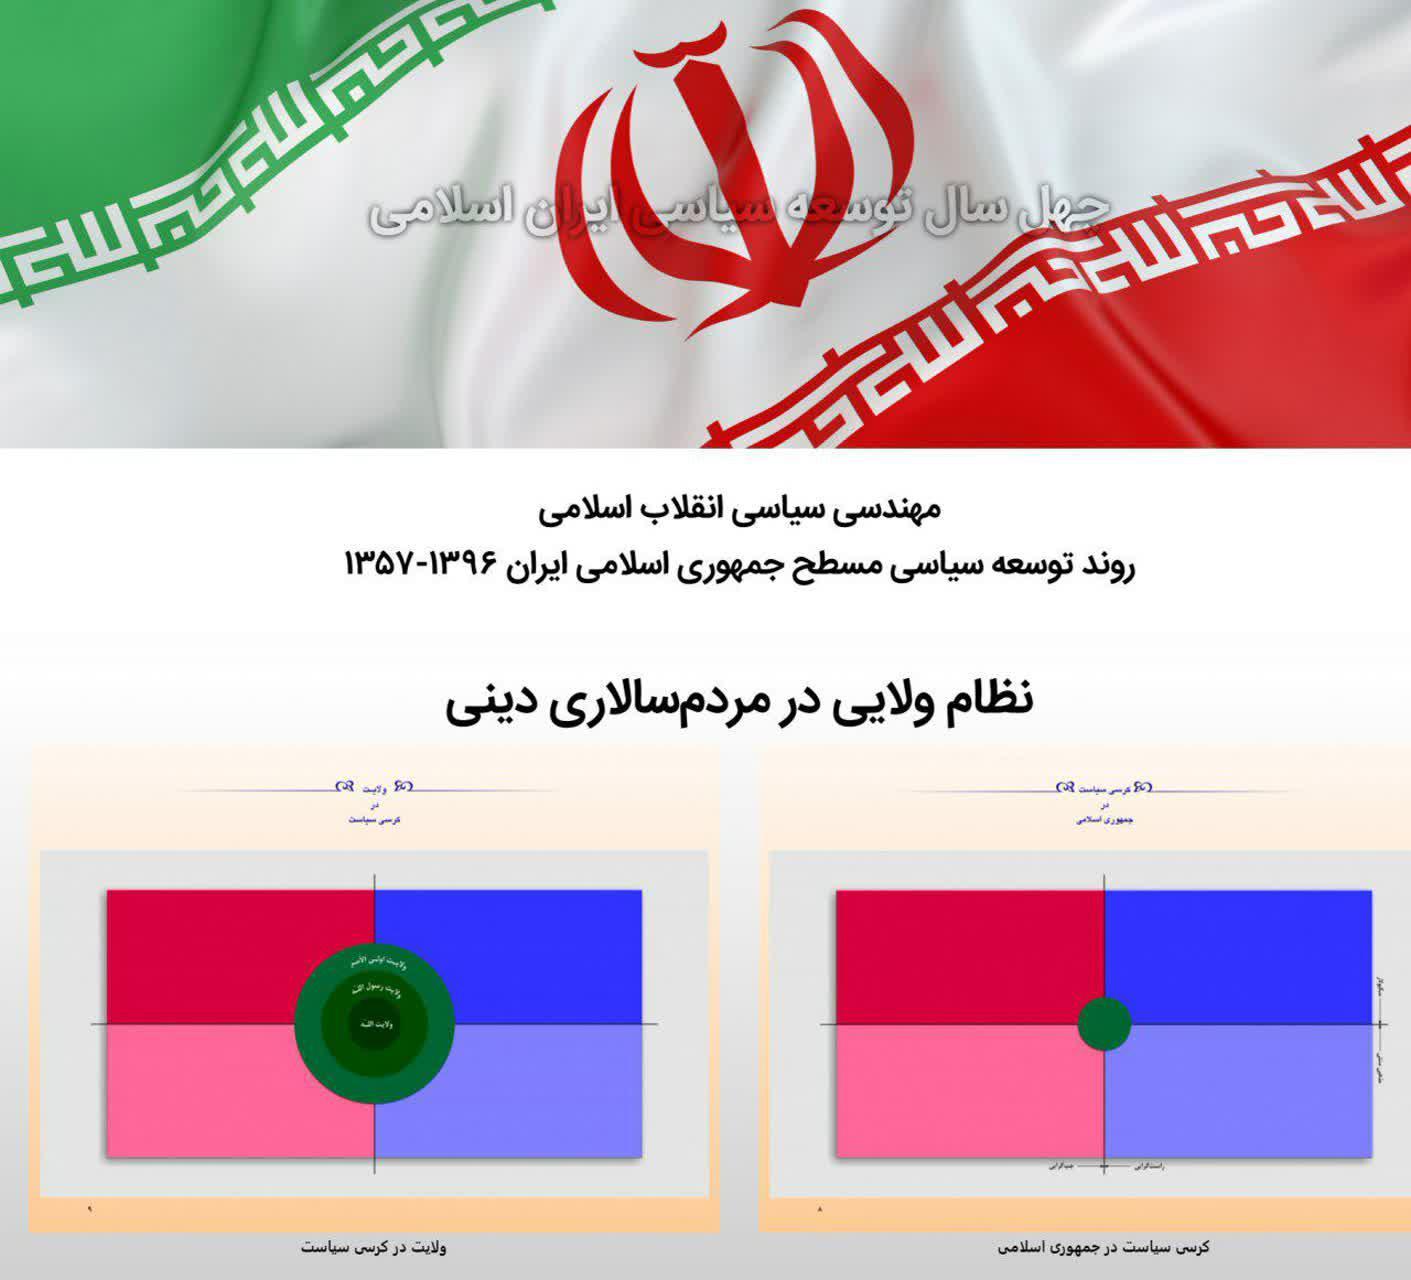 photo 2019 02 08 20 31 42 افتتاح سایت «مهندسی سیاسی» در آستانه جشن چهلسالگی انقلاب